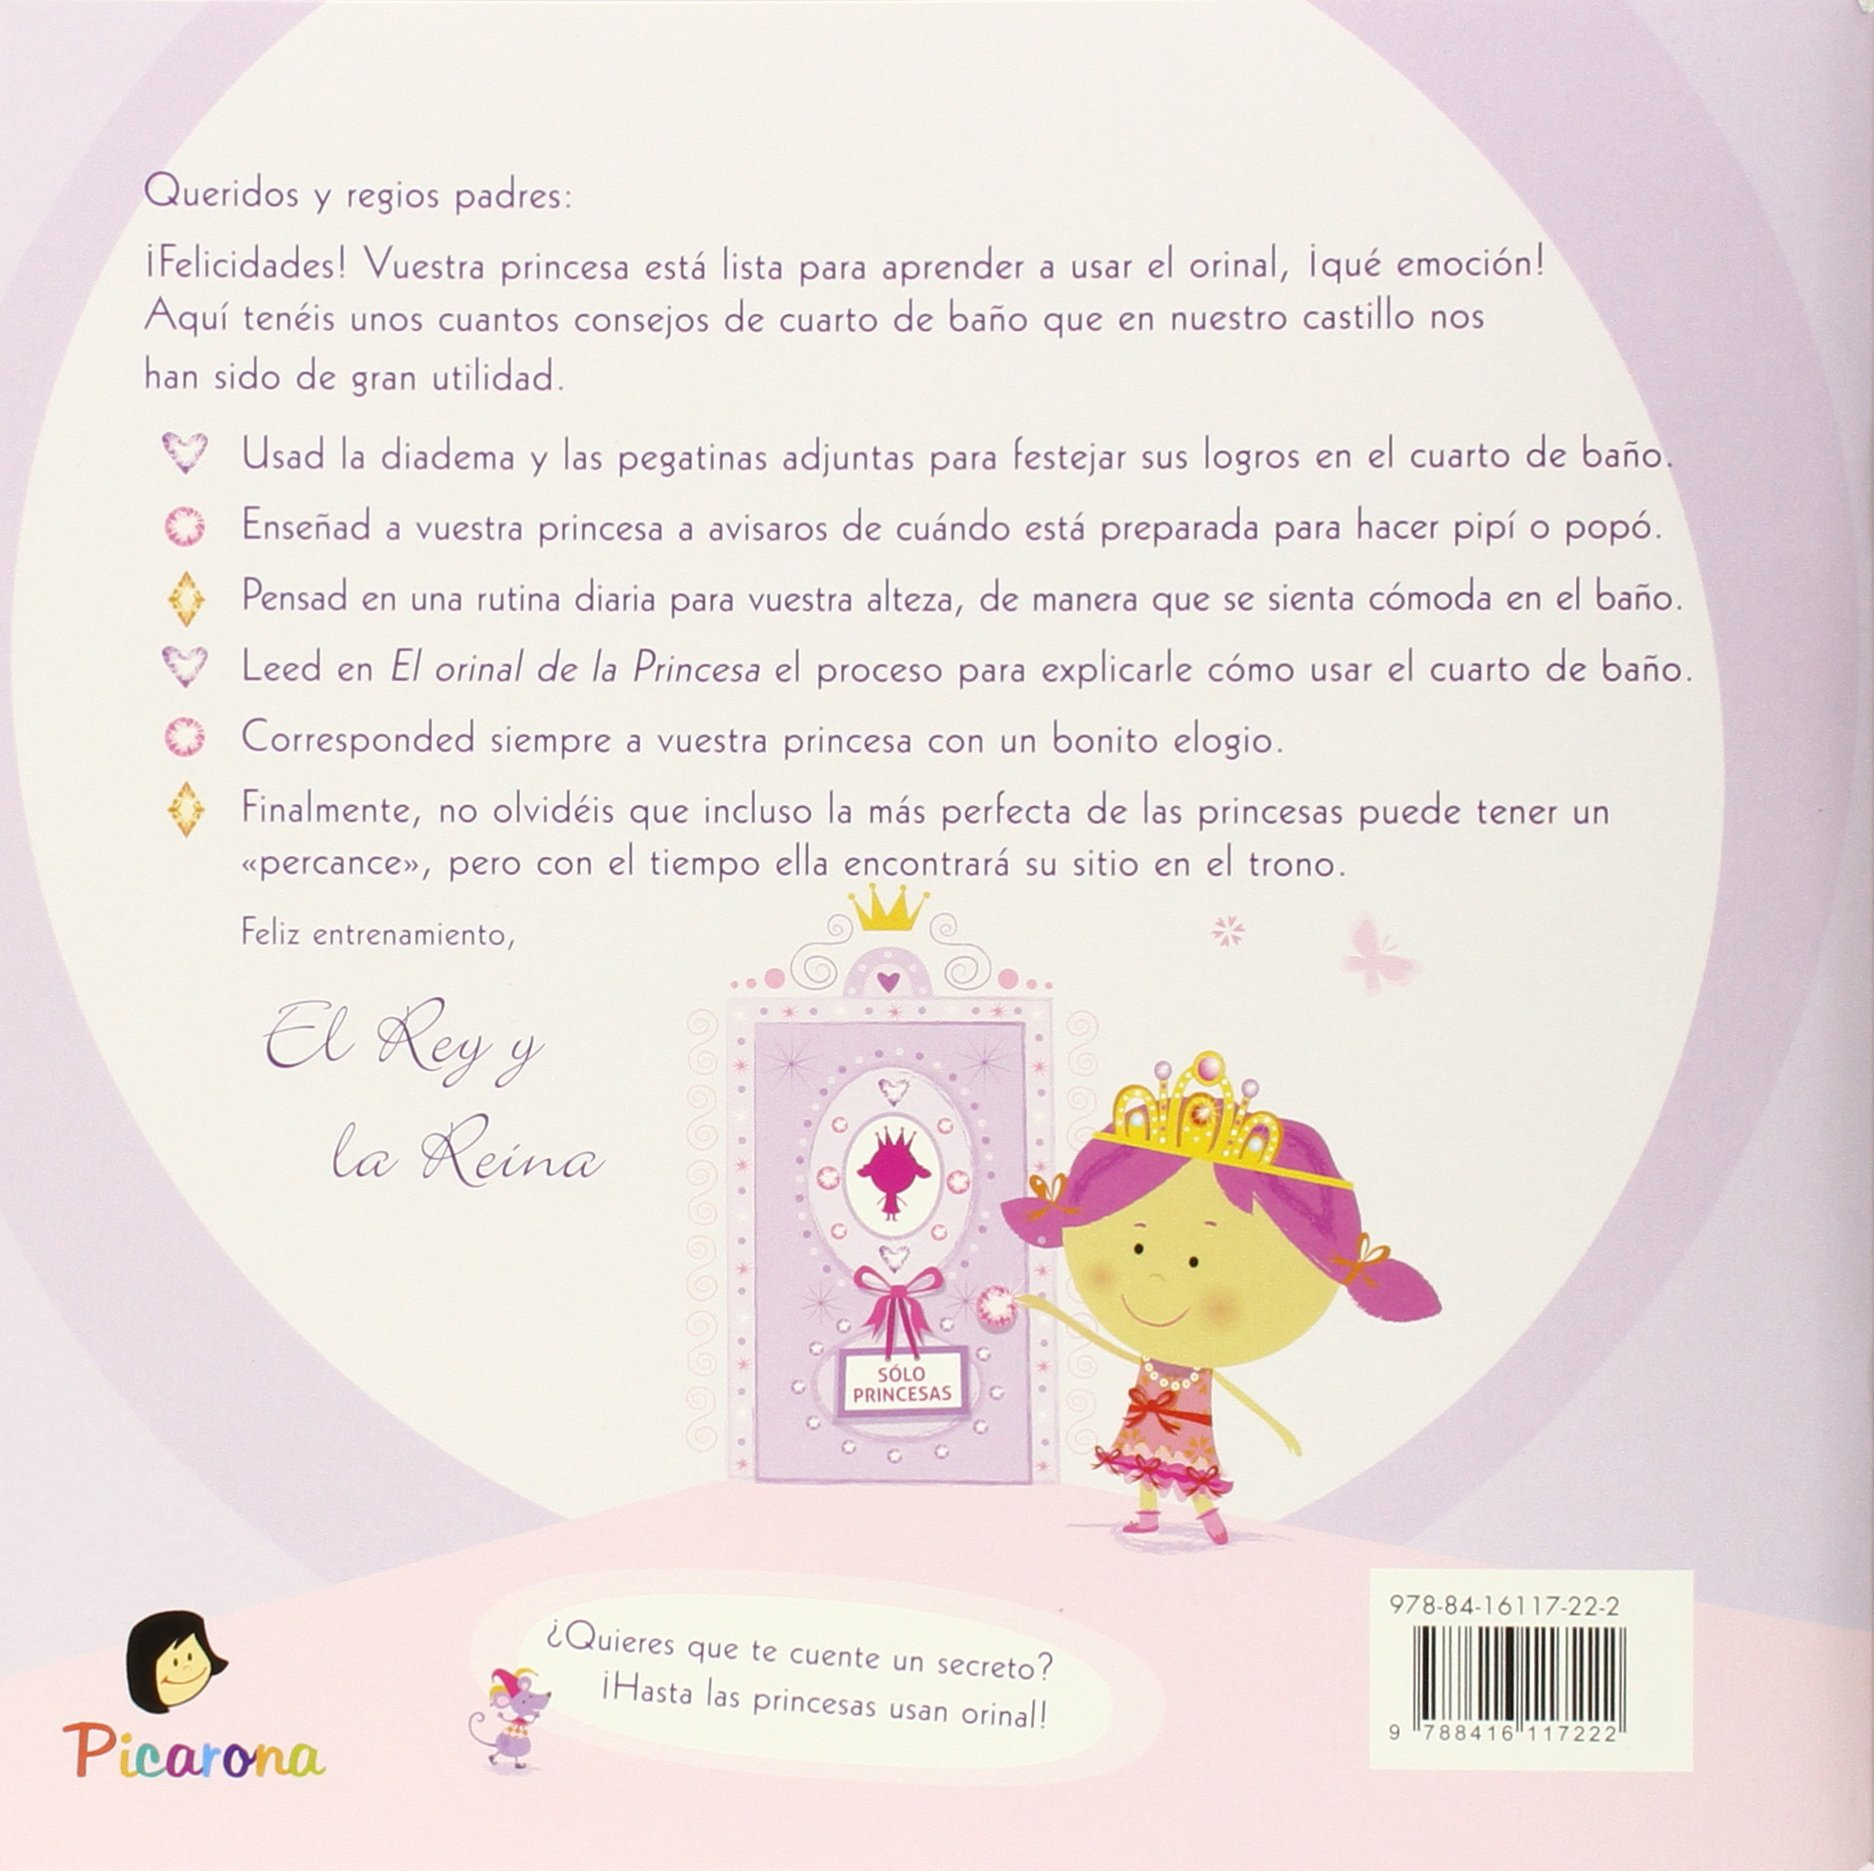 El orinal de la princesa (Spanish Edition): Samantha Berger: 9788416117222: Amazon.com: Books